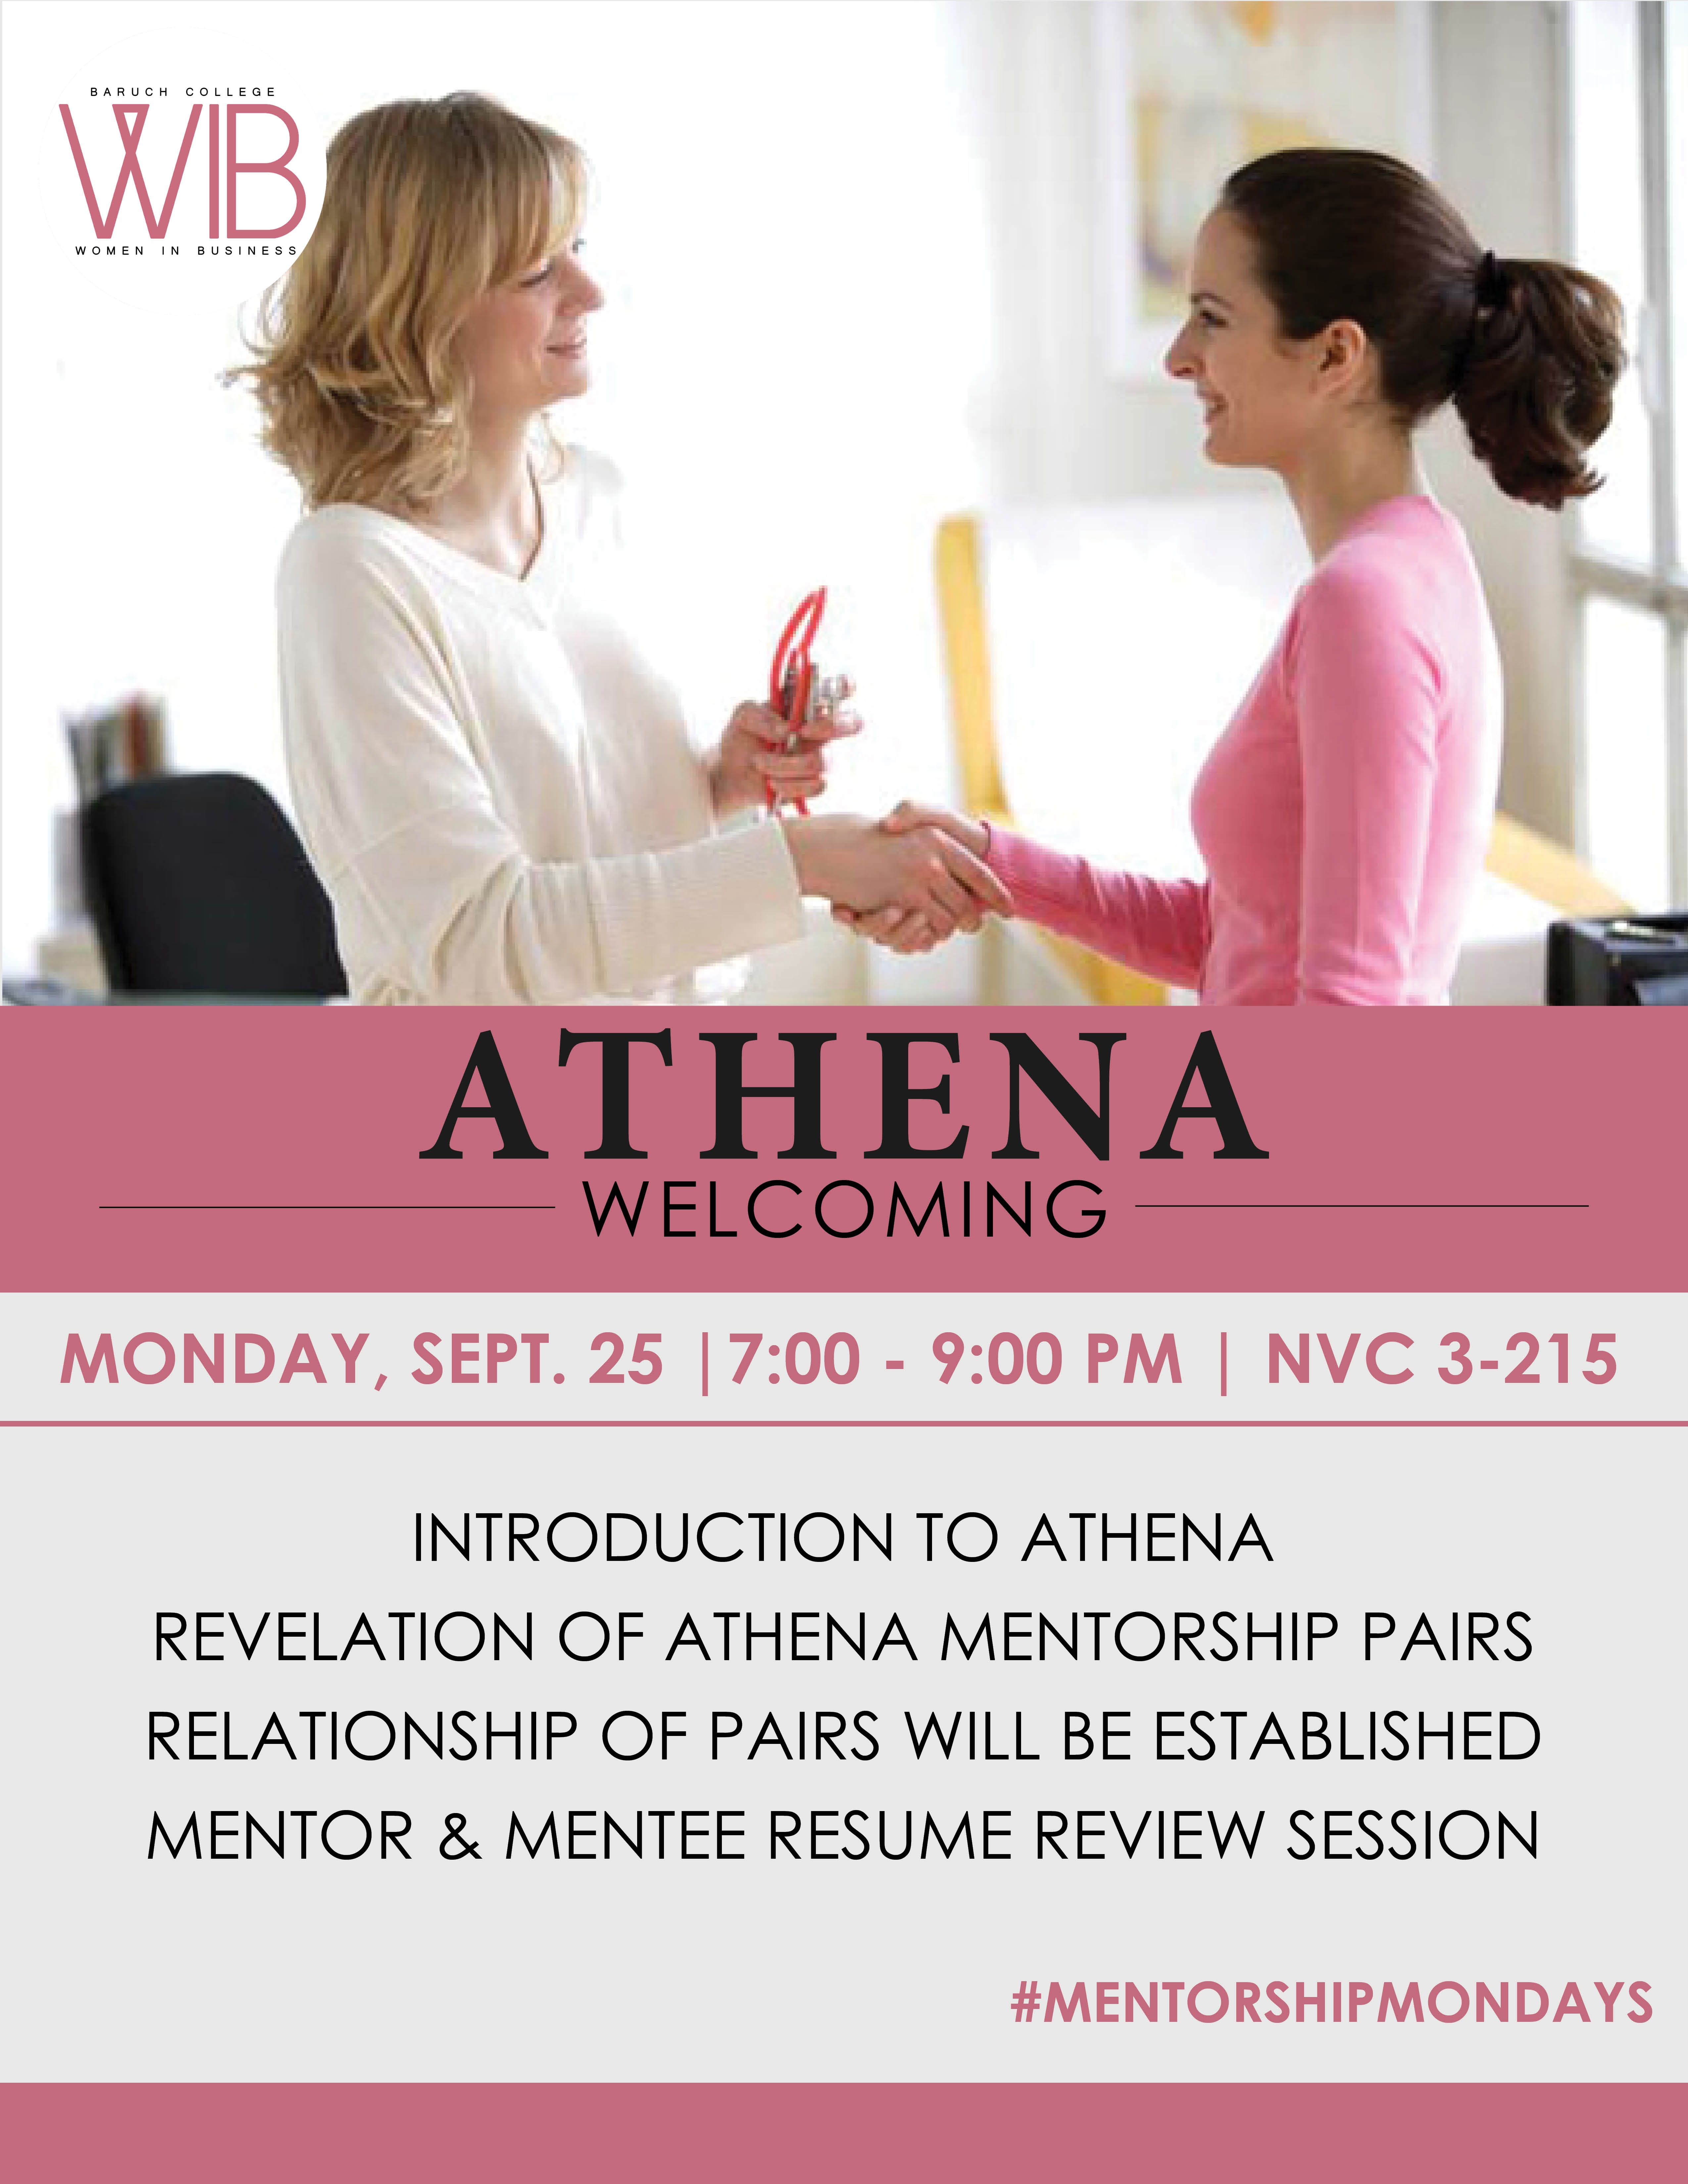 ATHENA welcoming